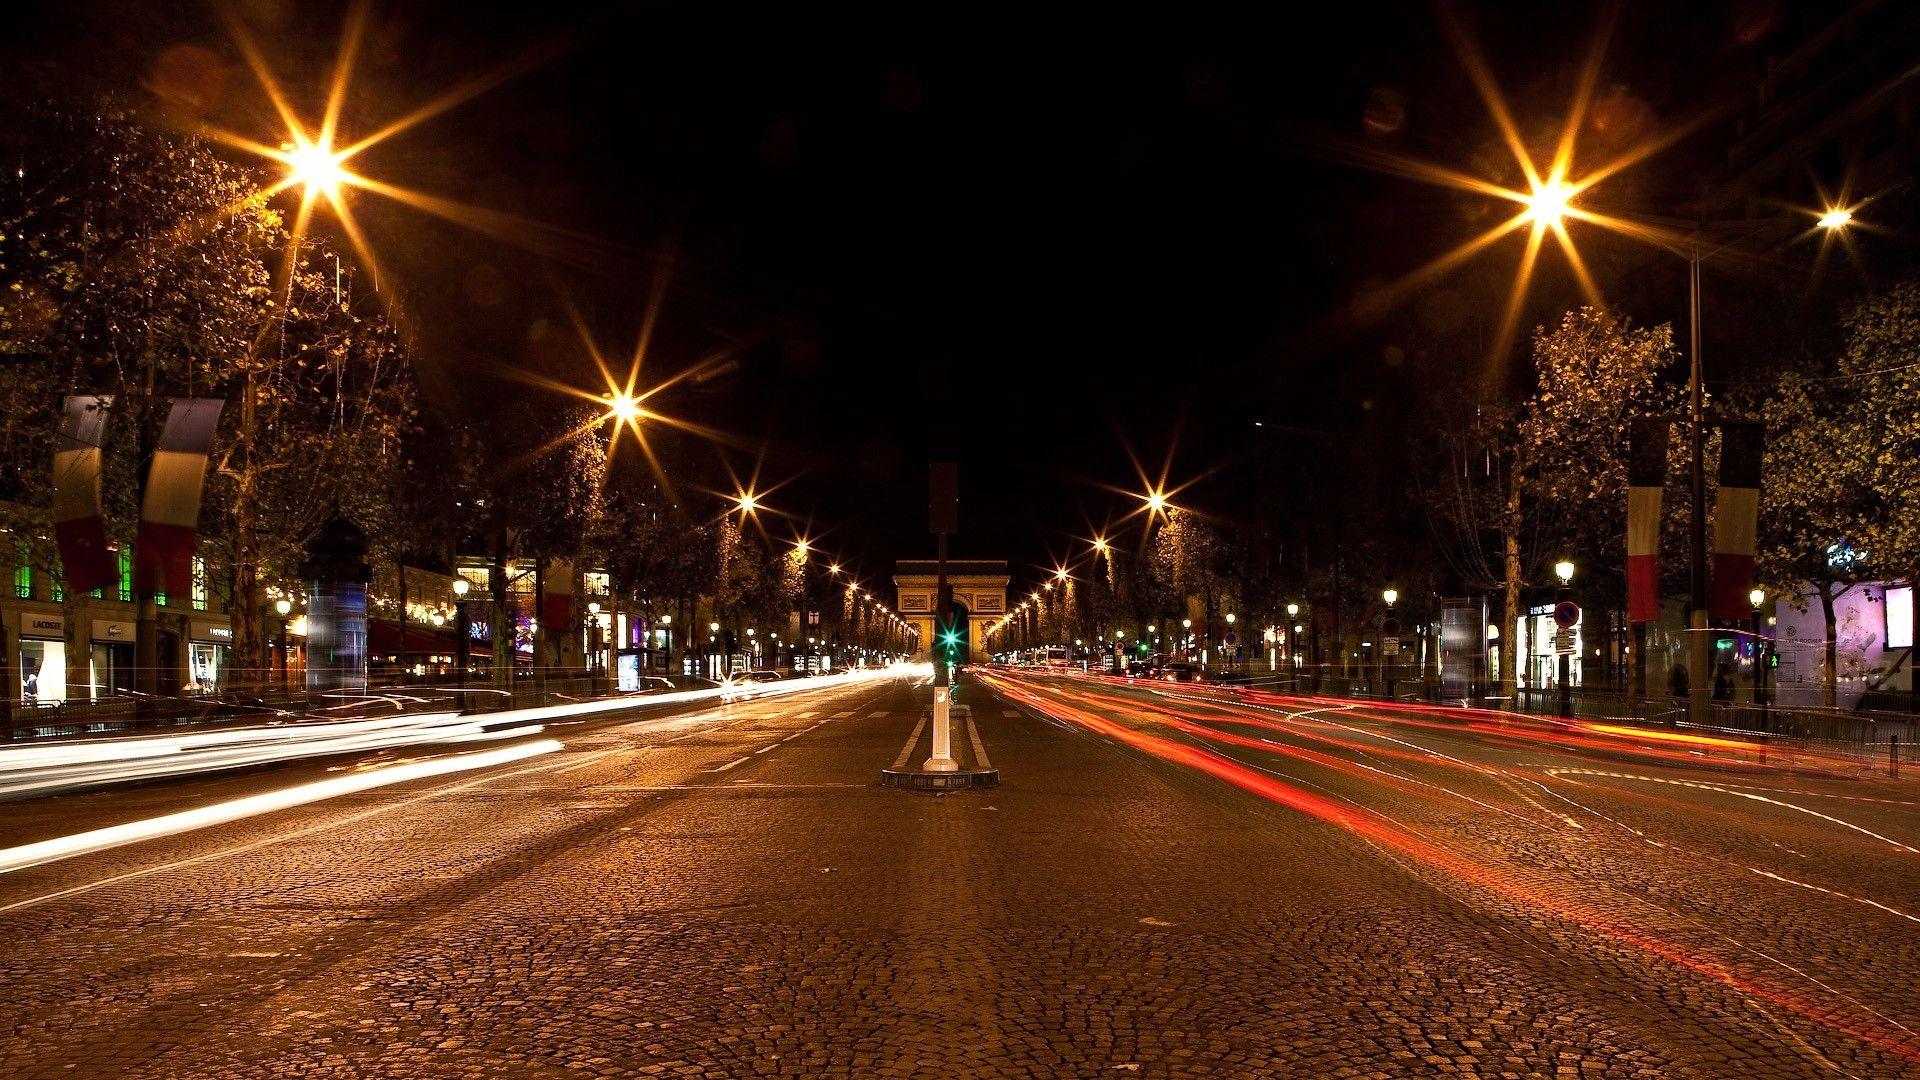 1920x1080 1920x1080 Wallpaper Germany Street Gates Night City Lights Night City City Road Street